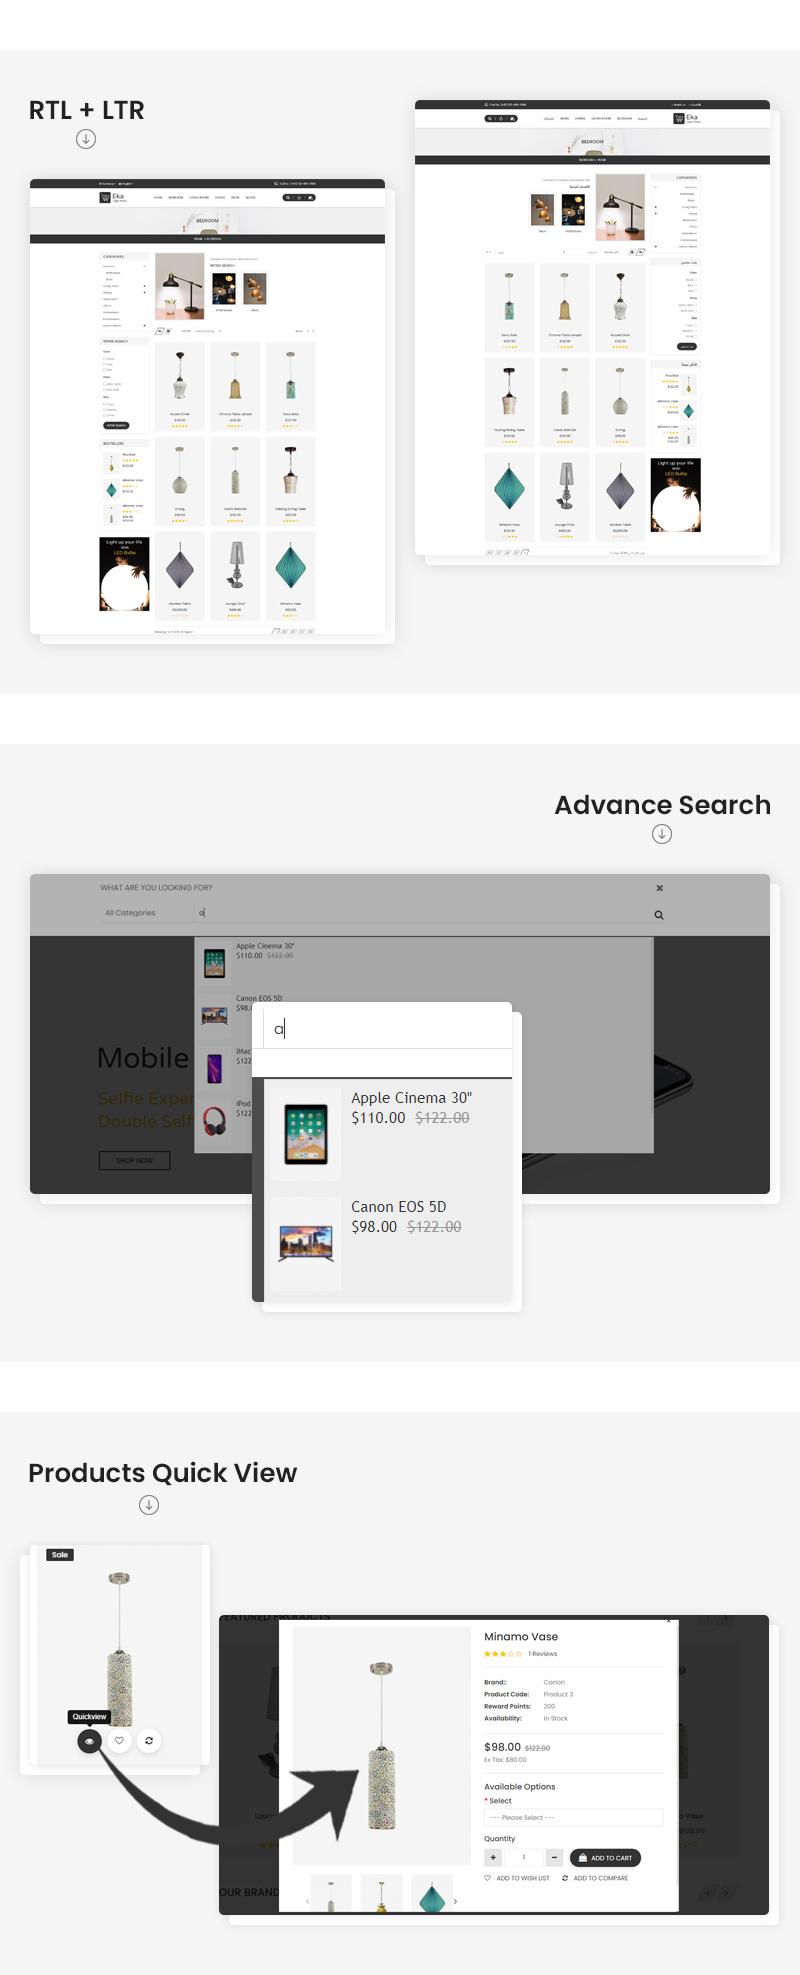 eka-features-2.jpg